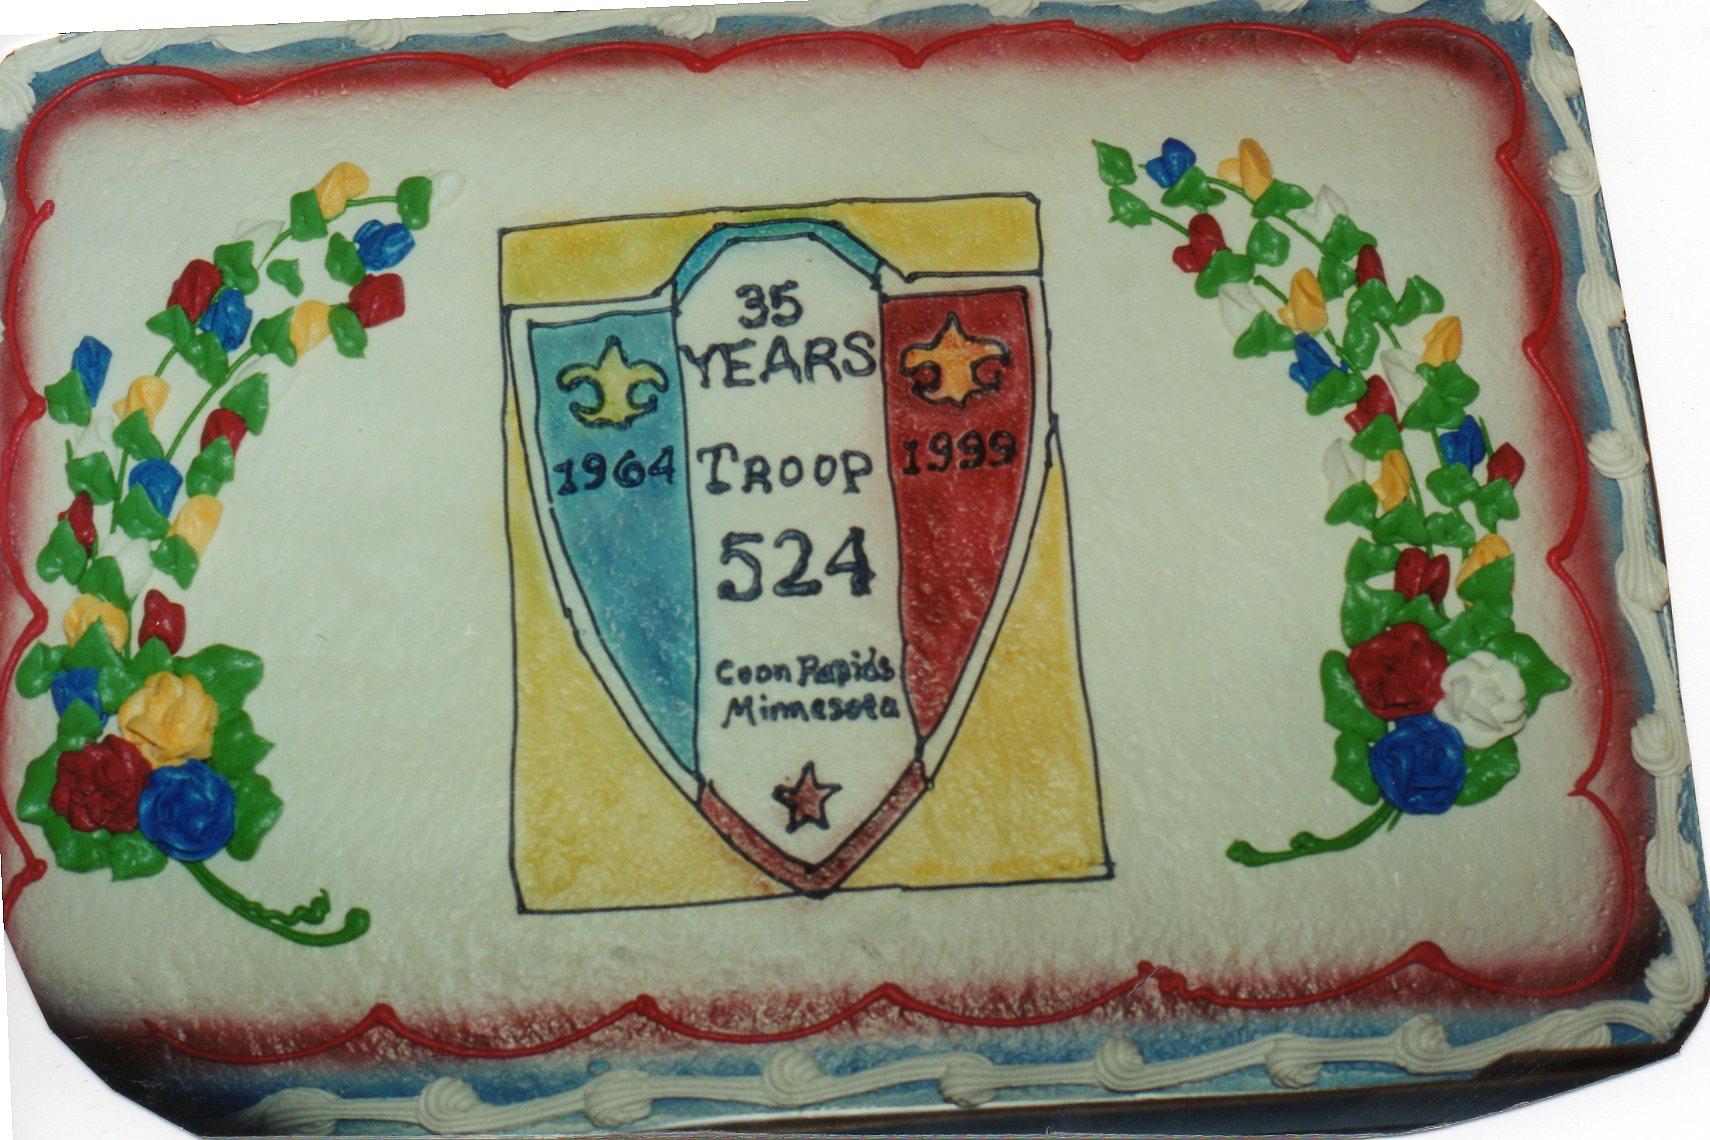 1999-35th Anniversary